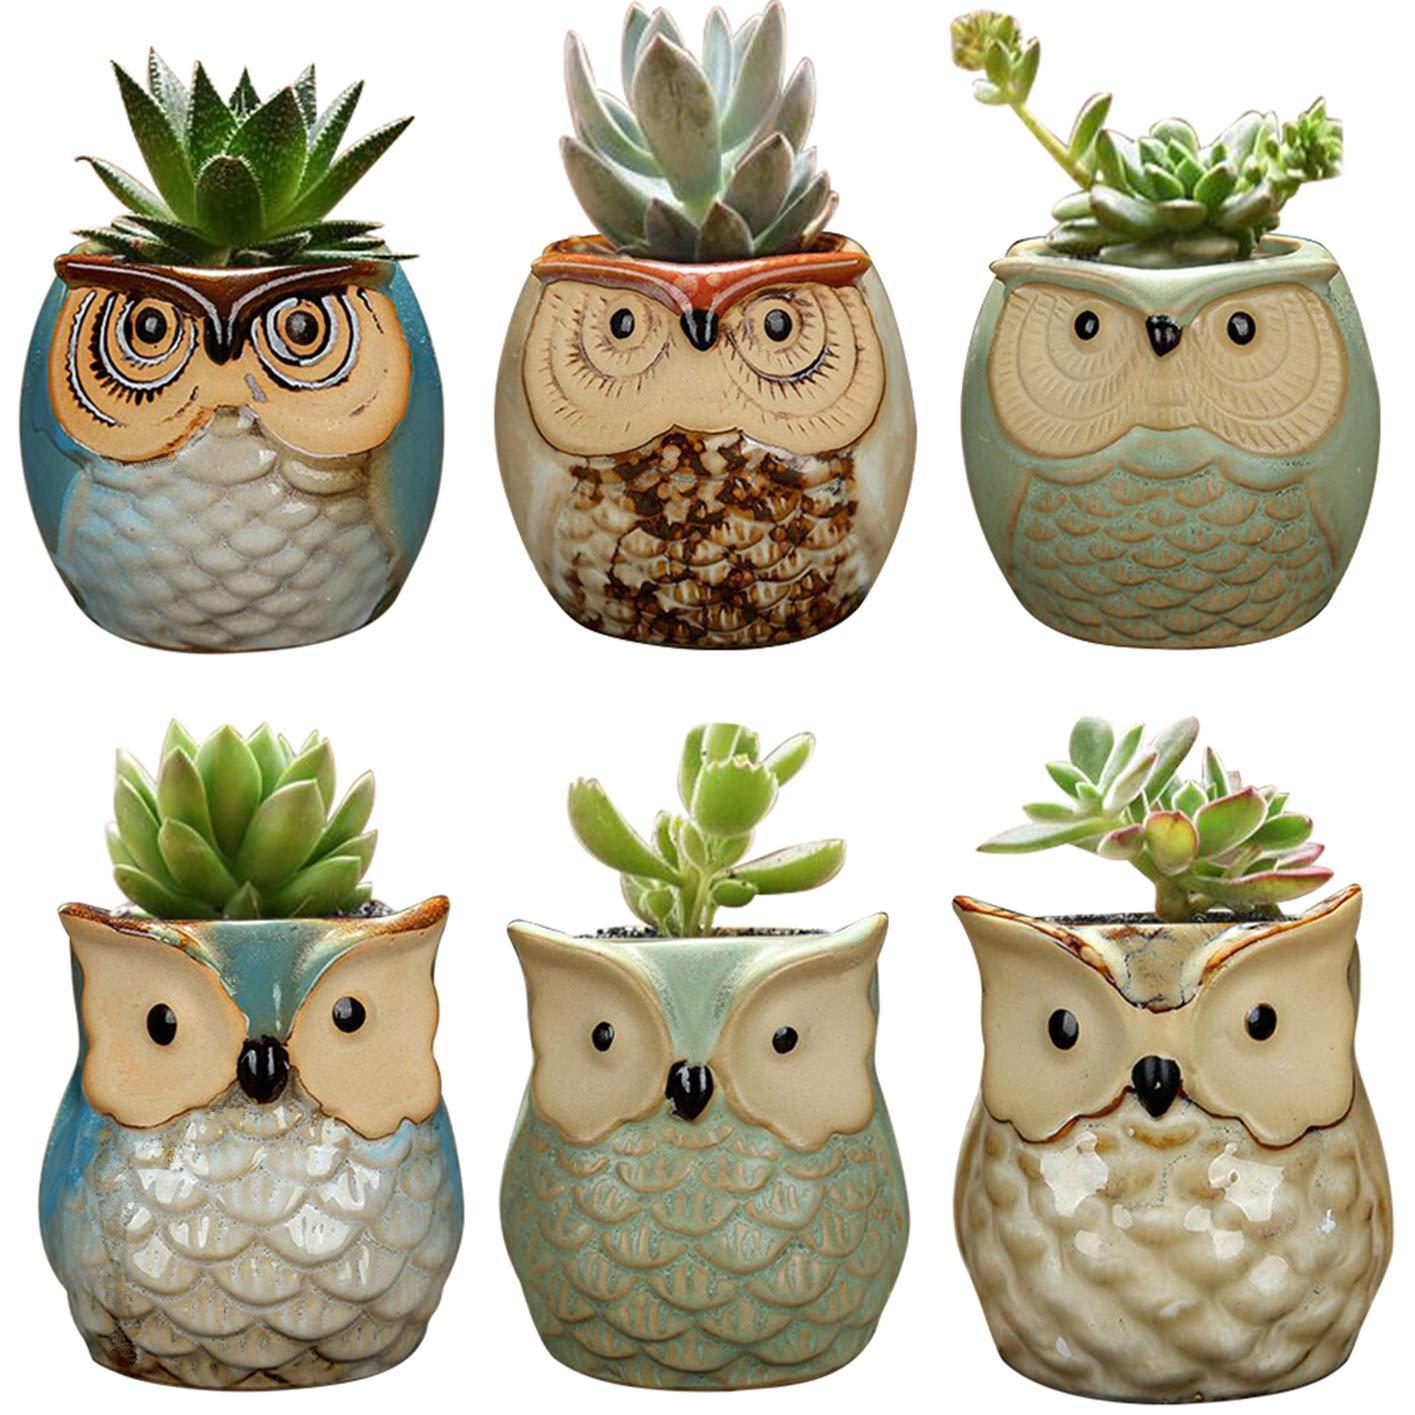 YLINGSU Cerami Succulent Cactus Plant Flower Conta 6 in Set 2.5 inch Owl Pot Ceramic Flowing Glaze Base Serial Se, Blue